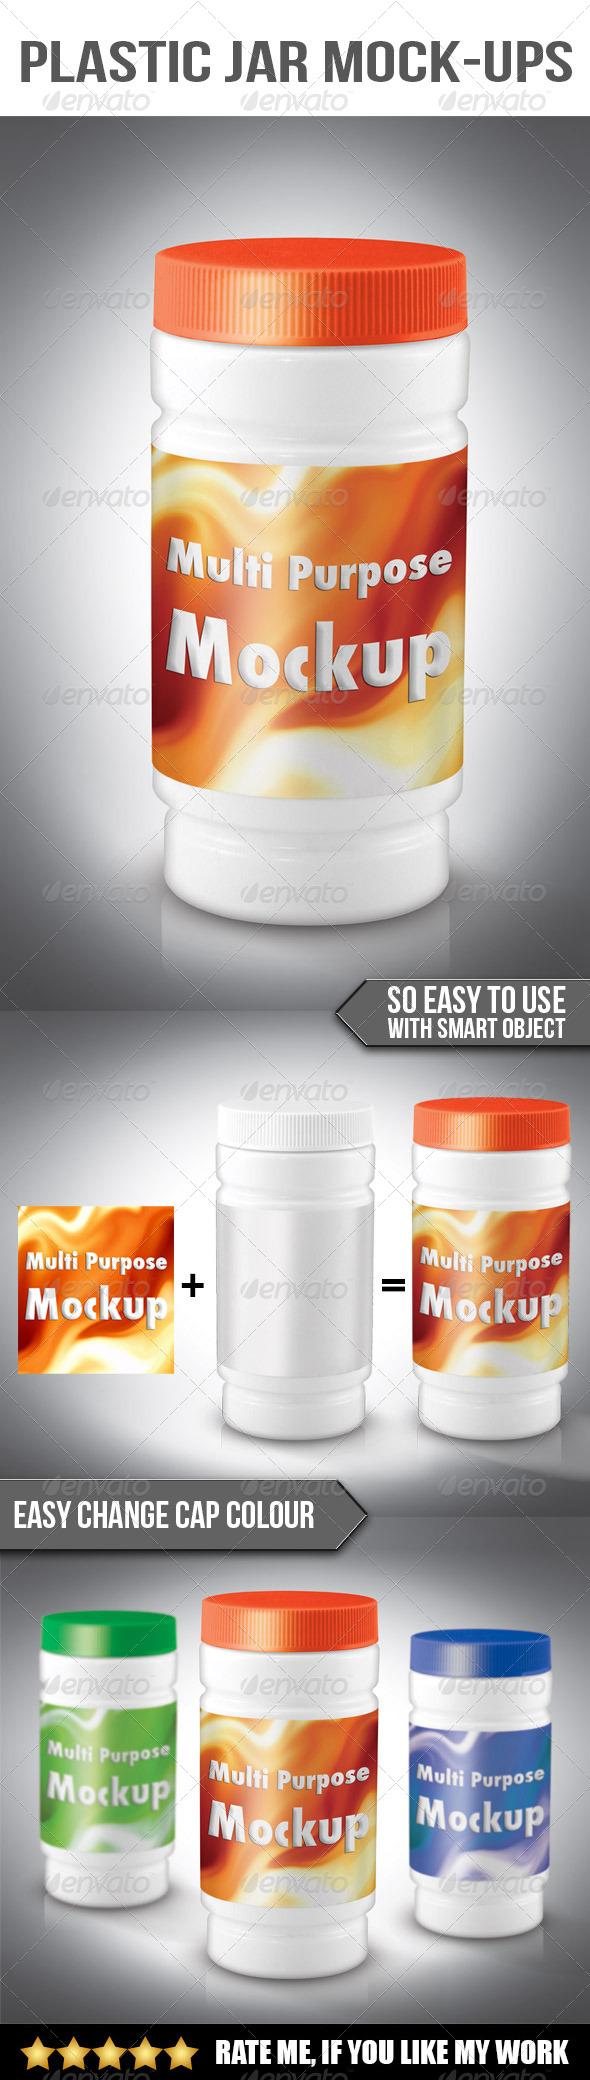 Plastic jar mockup - Product Mock-Ups Graphics